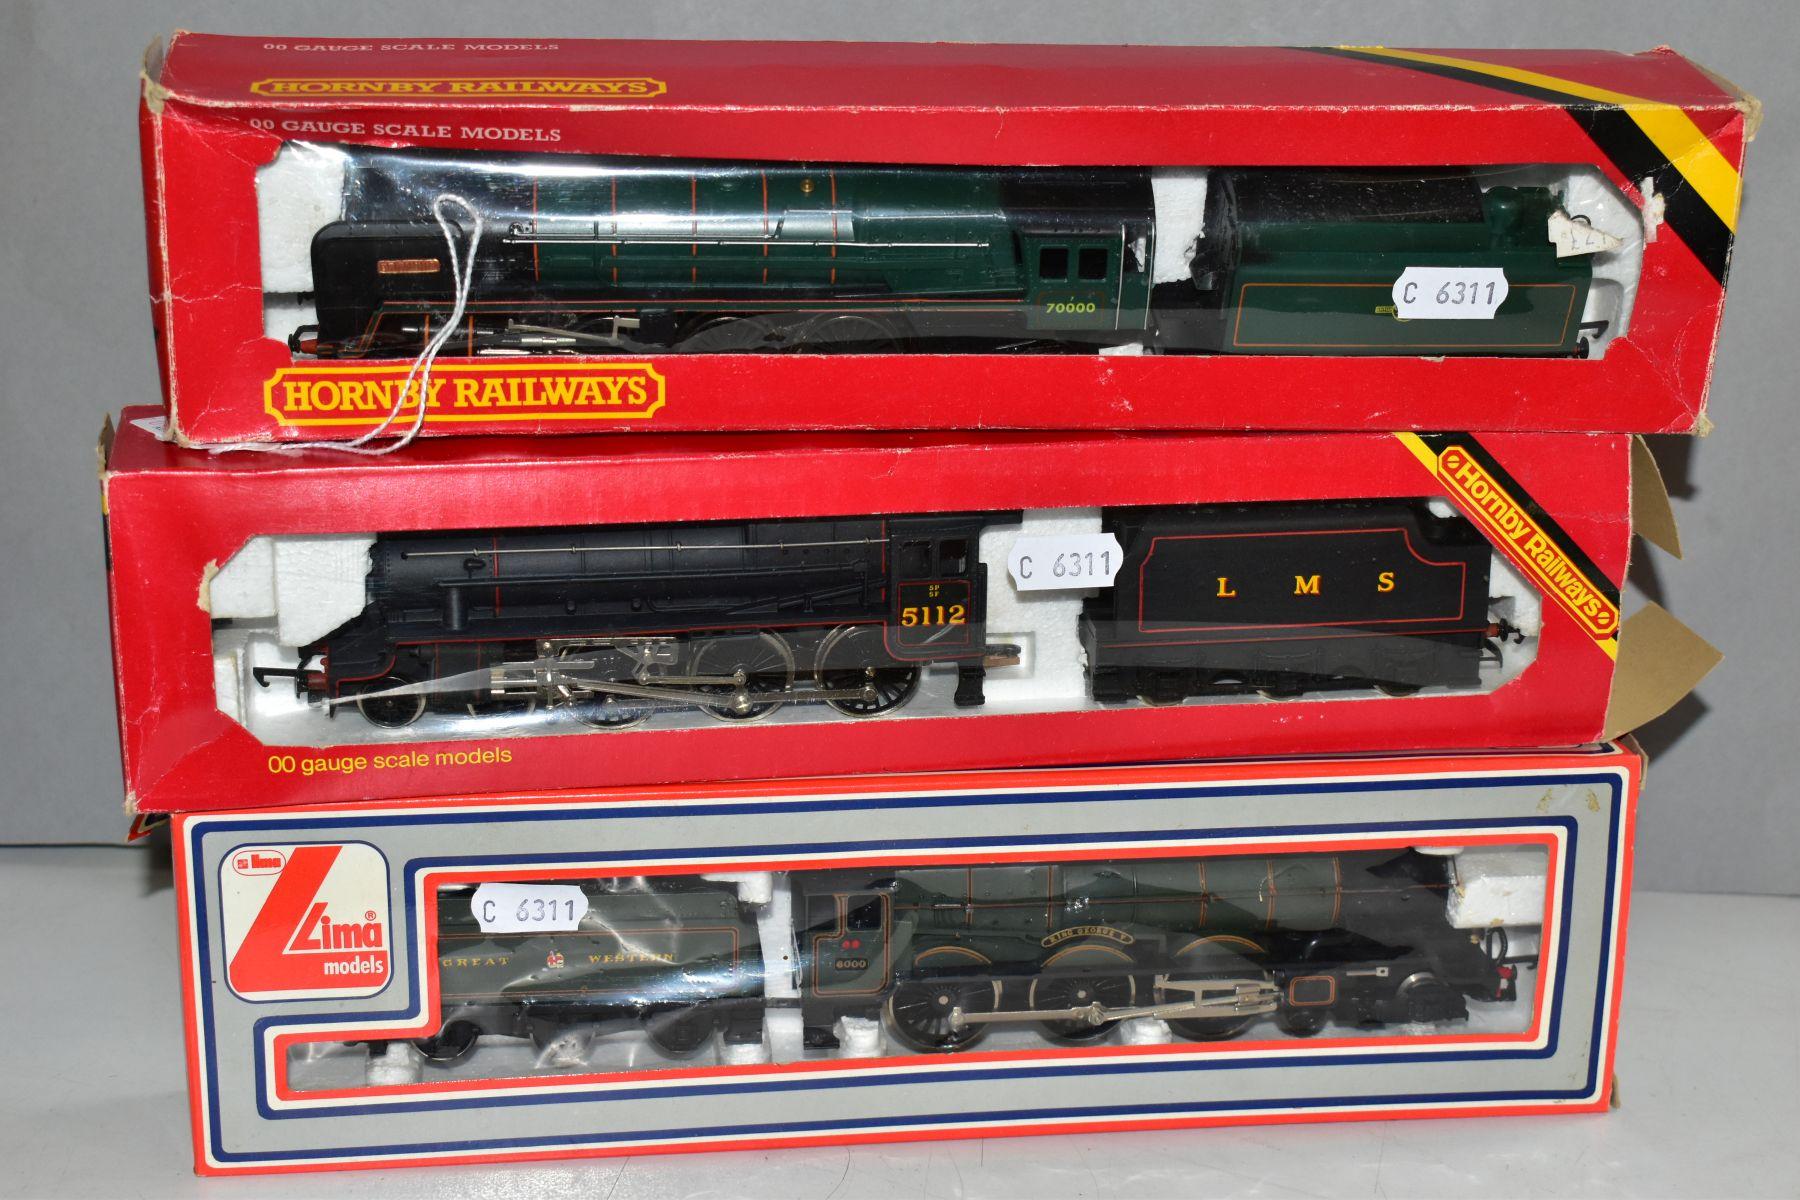 THREE BOXED 00 GAUGE MODEL RAILWAY LOCOMOTIVES, Hornby Britannia Class 'Britanna' No. 70000, B.R.